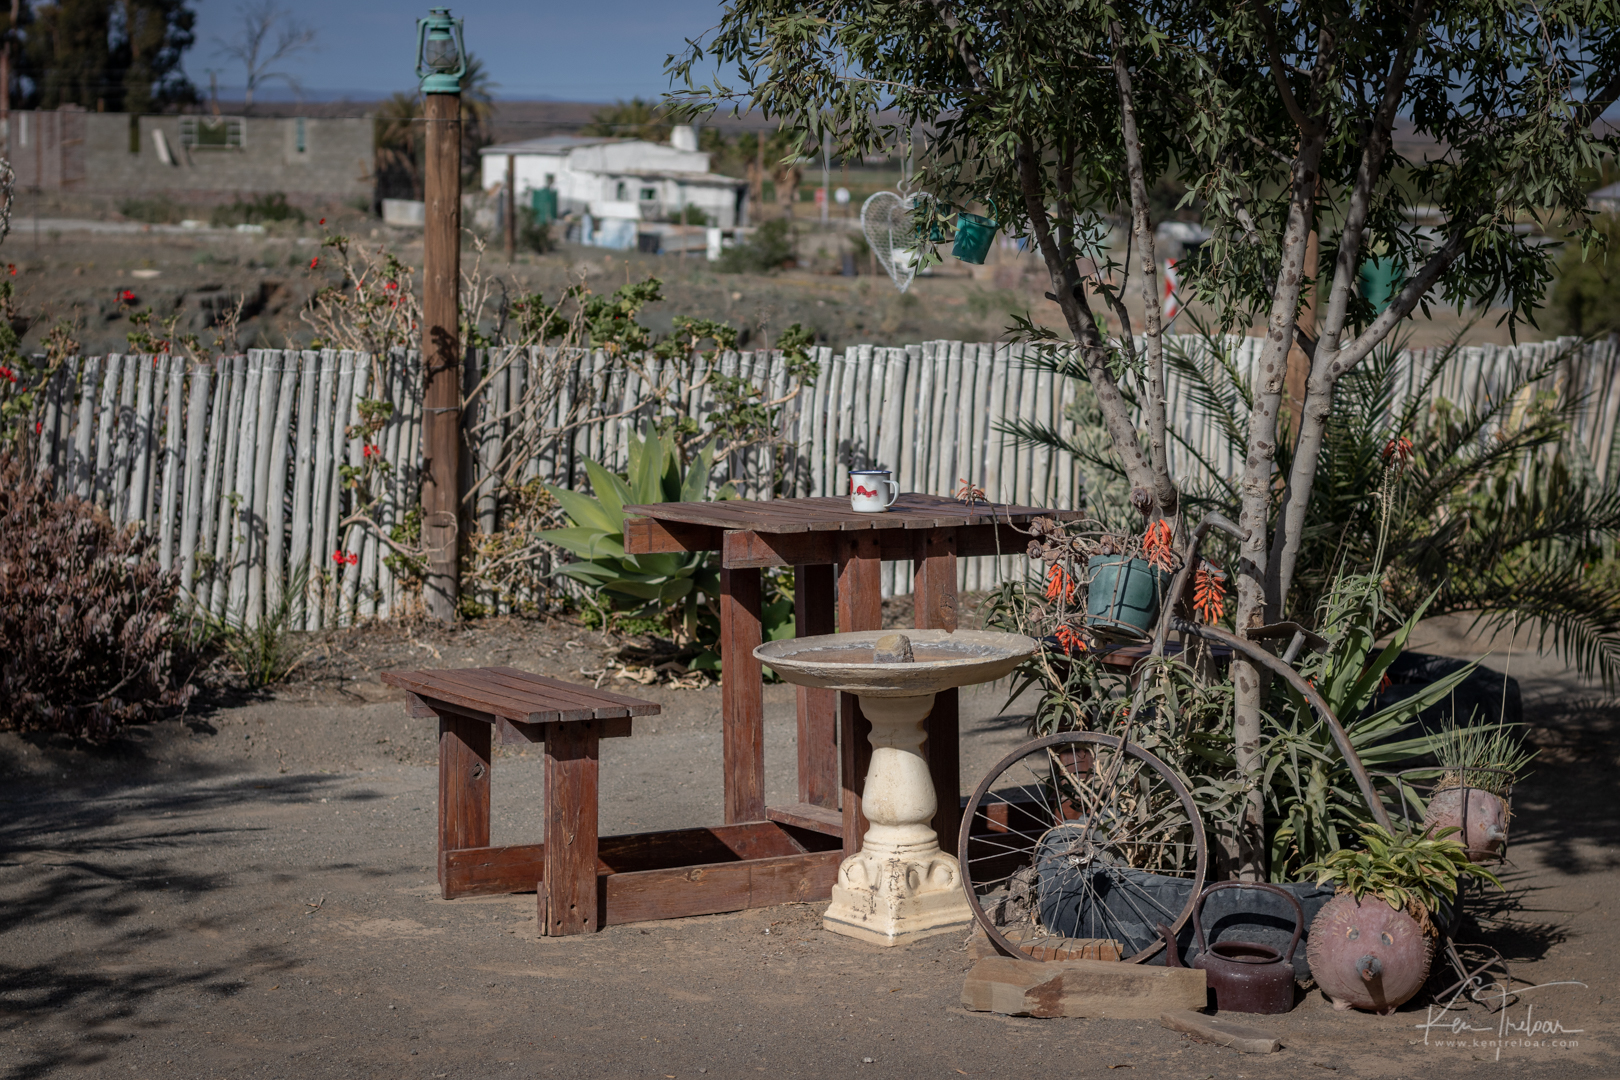 Padstal South Africa, Gamka, Prince Albert, Western Cape, N1 - by Ken Treloar Photography-4.jpg